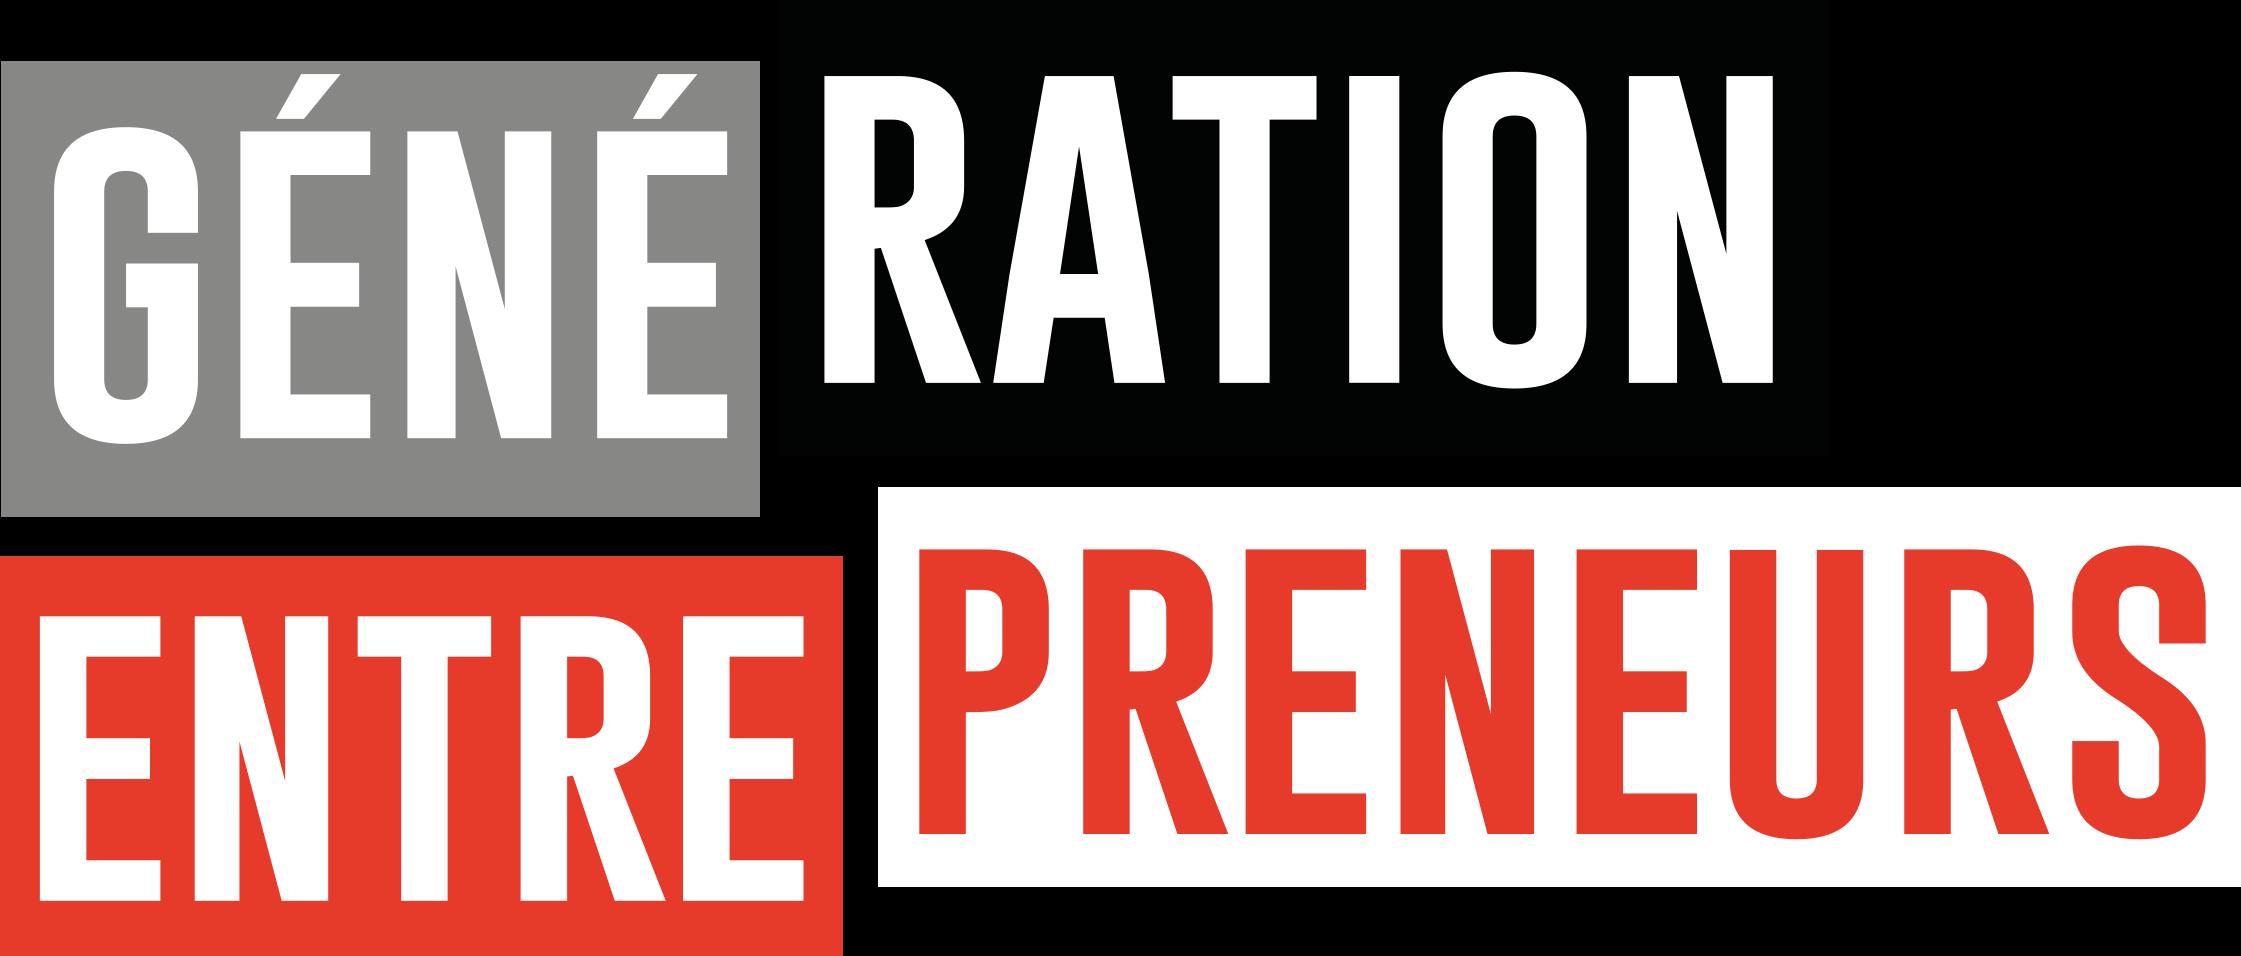 generation entrepreneurs